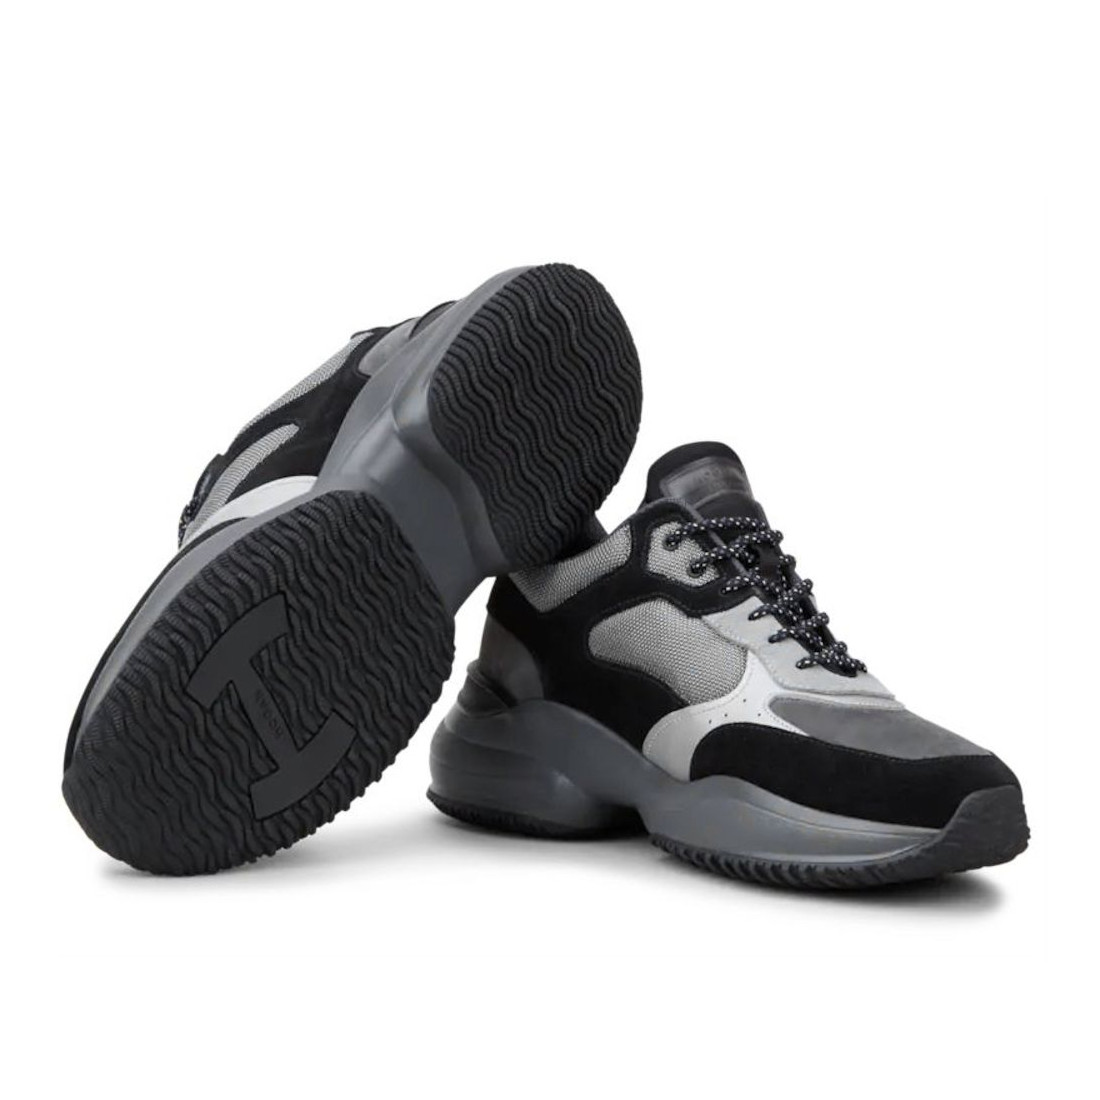 sneakers man hogan hxm5450dh10osx837z 7682